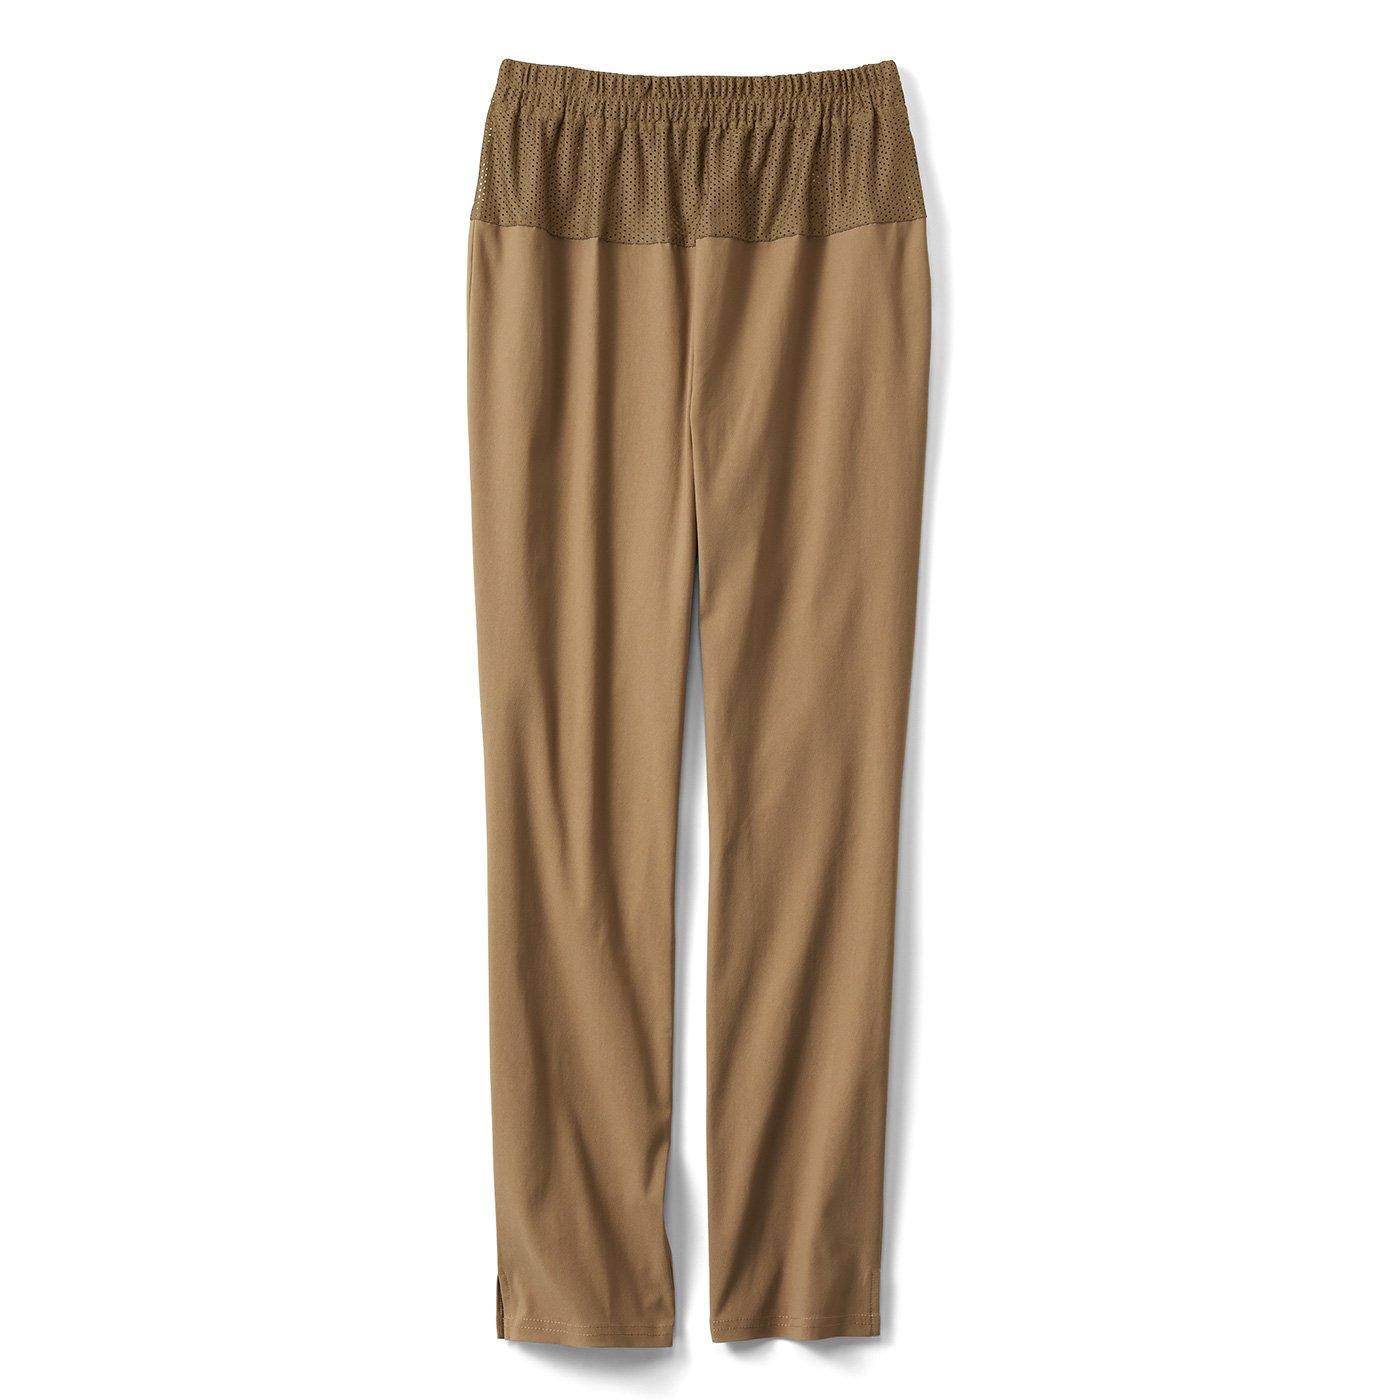 IEDIT[イディット] ウエストメッシュで快適 ストレッチ布はく素材の美脚レギンスパンツ〈ベージュ〉